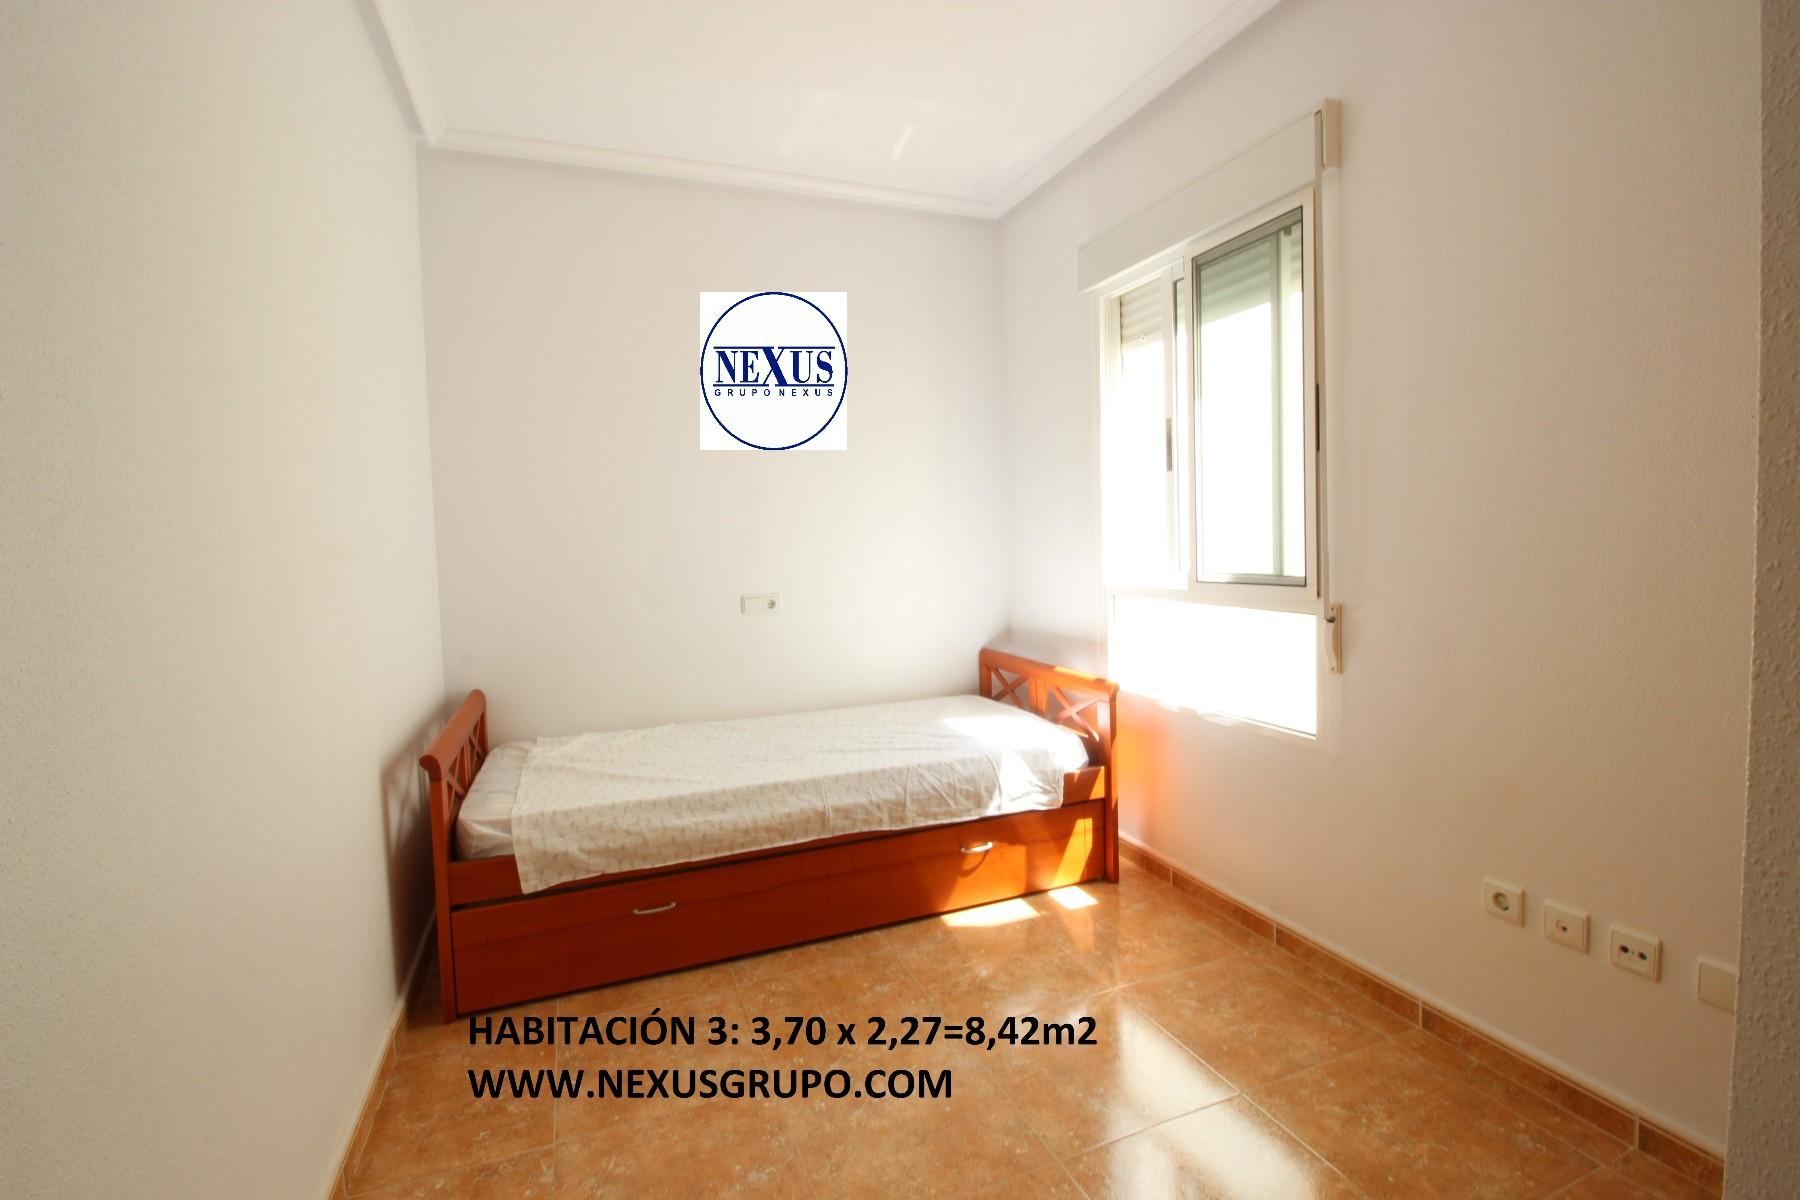 Nexus Group Real Estate Agency sells excellent duplex apartment. in Nexus Grupo